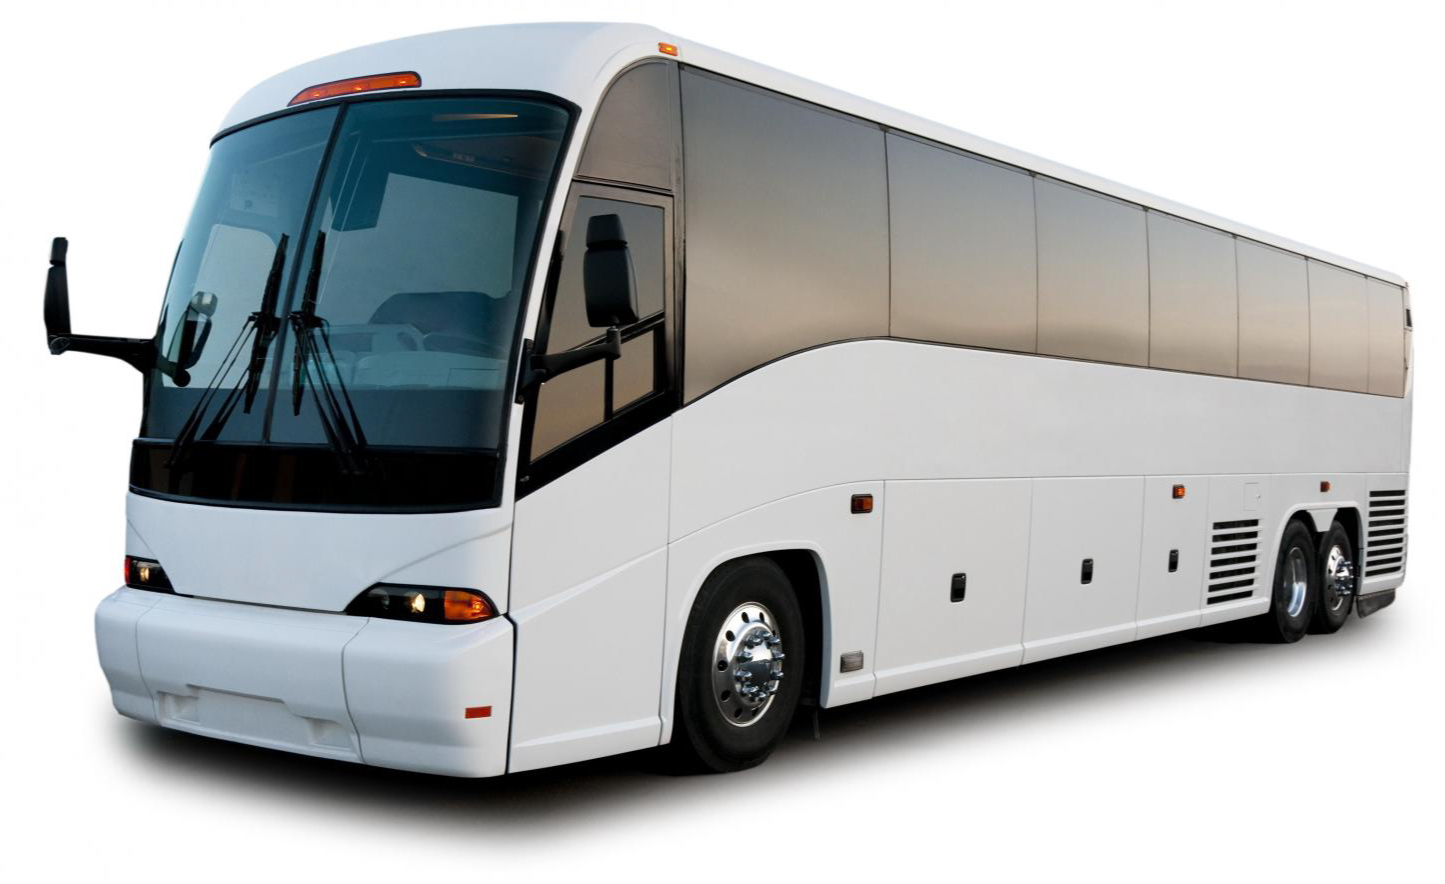 Cville+Motorcoach+Charter+Bus+Field+Trips.jpg